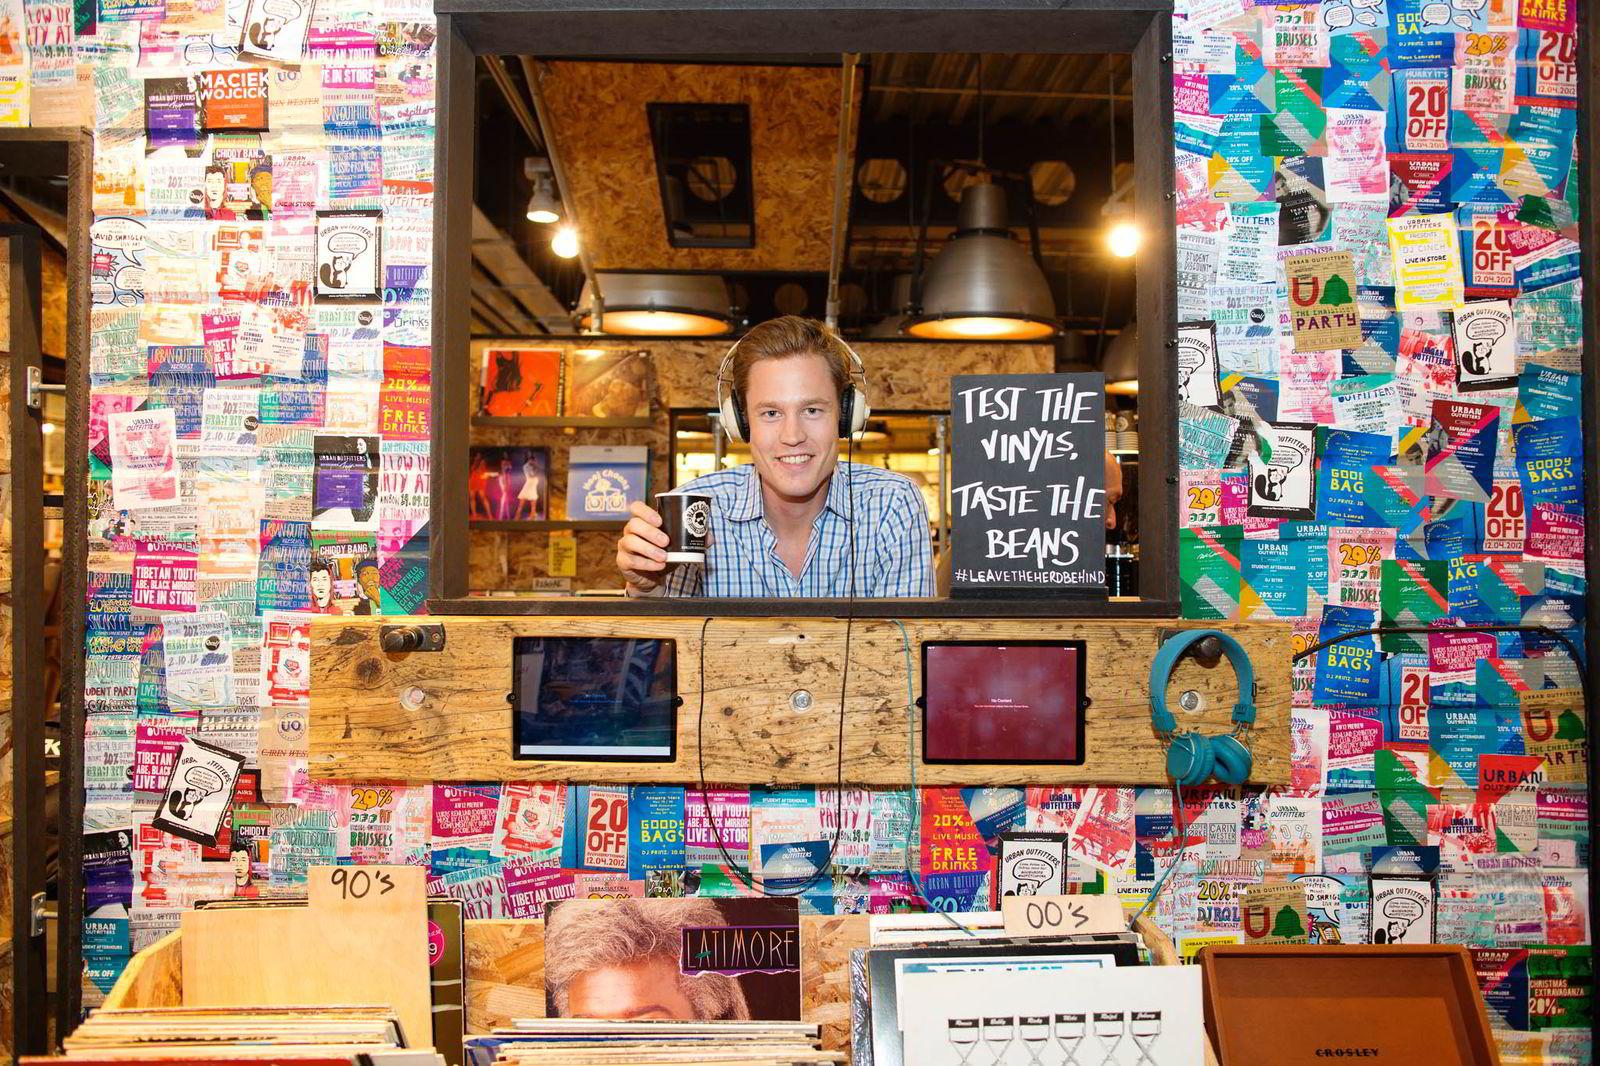 SATSER I LONDON. Inne i flaggskipbutikken til Urban Outfitters på Oxford street i London har Eirik Holth solgt kaffen til Black Sheep Coffee i hele sommer.